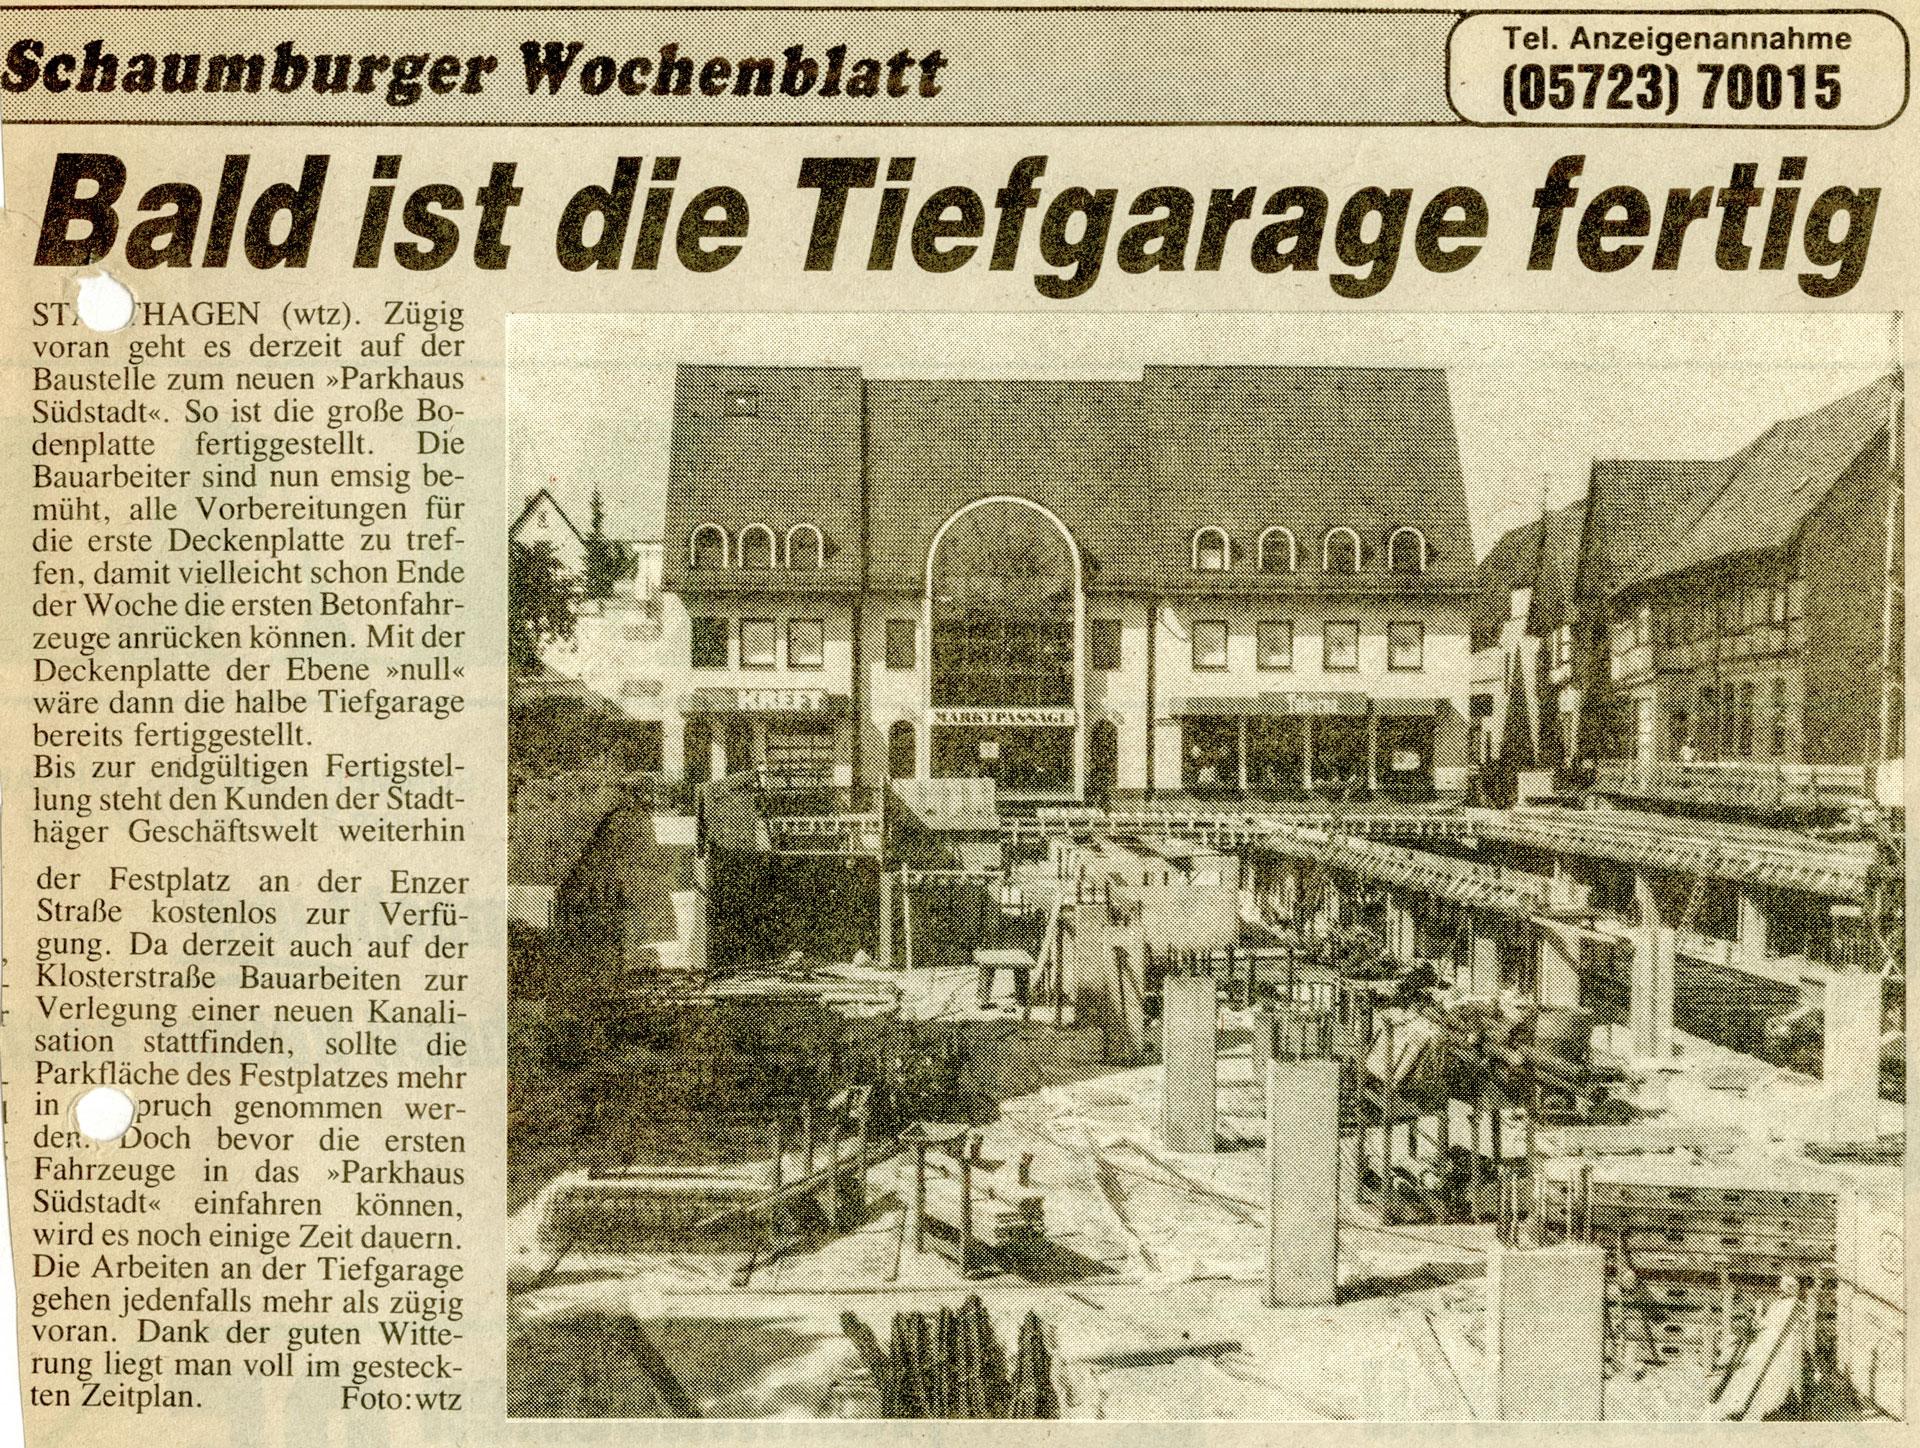 Wochenblatt-2-8-1989-Bericht